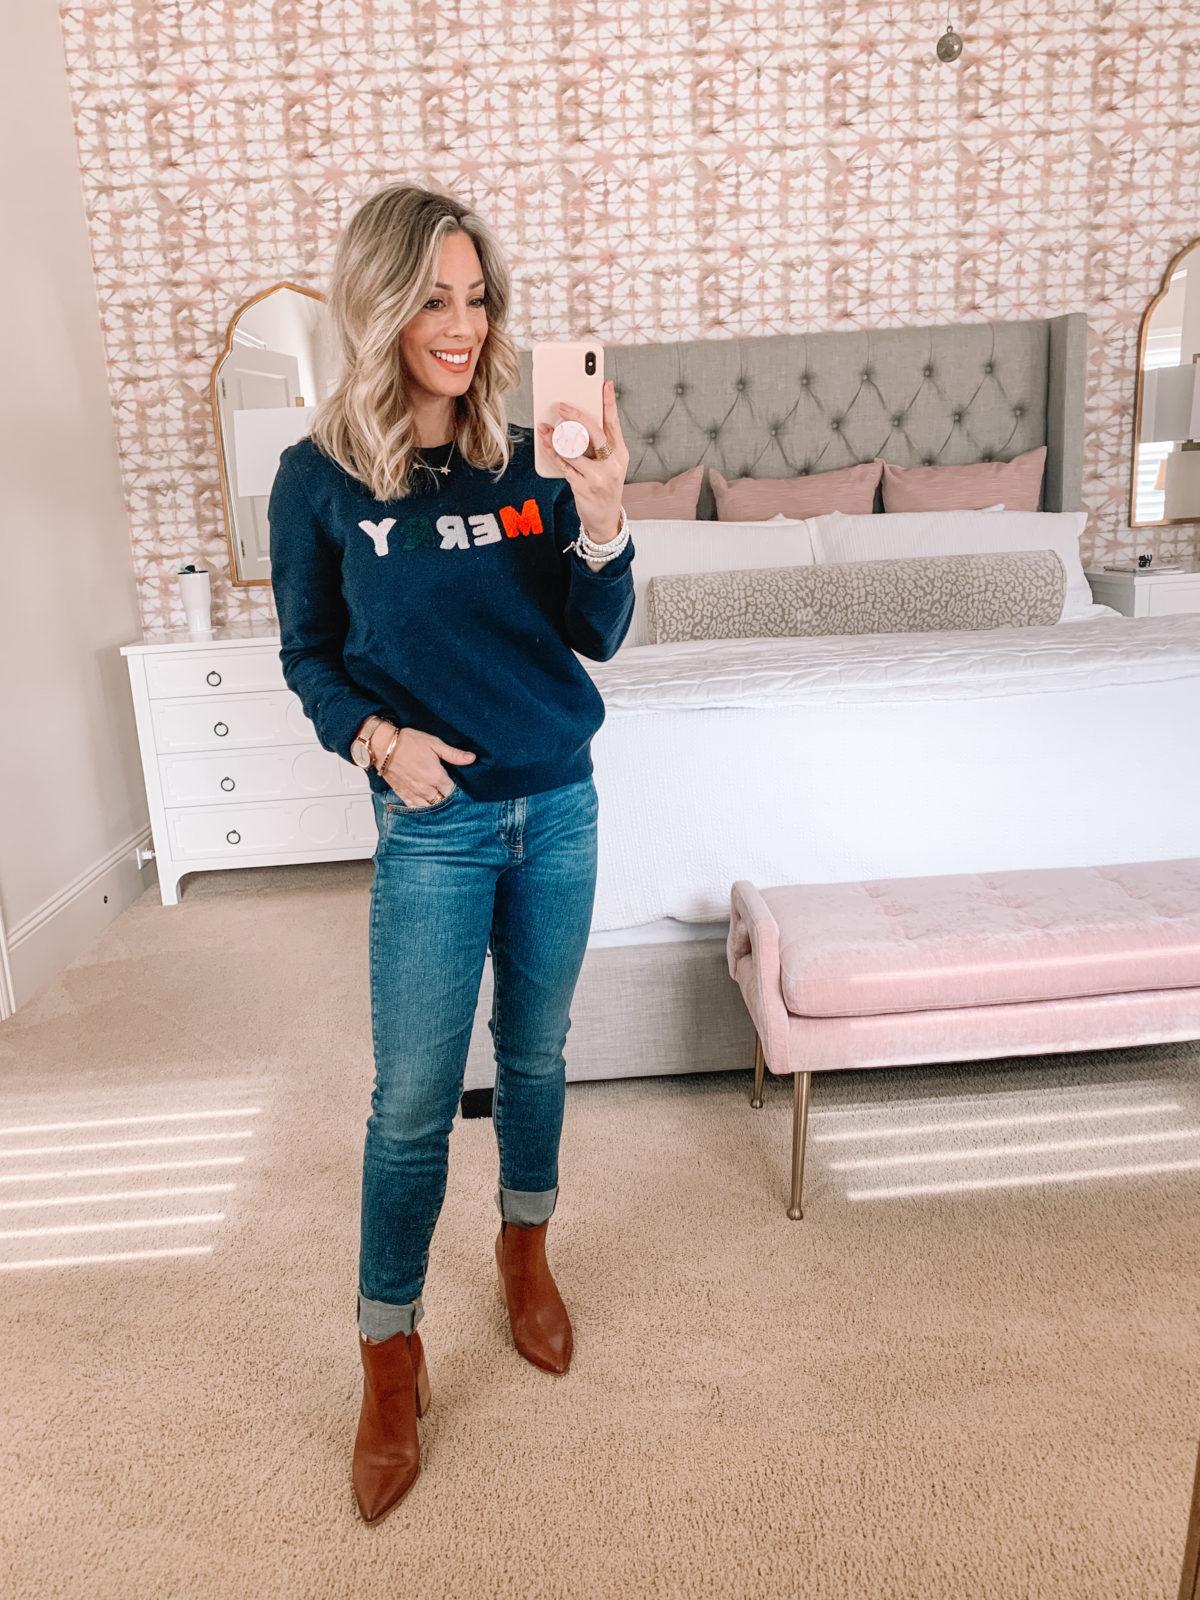 Dressing Room try on Nordstrom, Merry Sweatshirt, Jeans, Booties